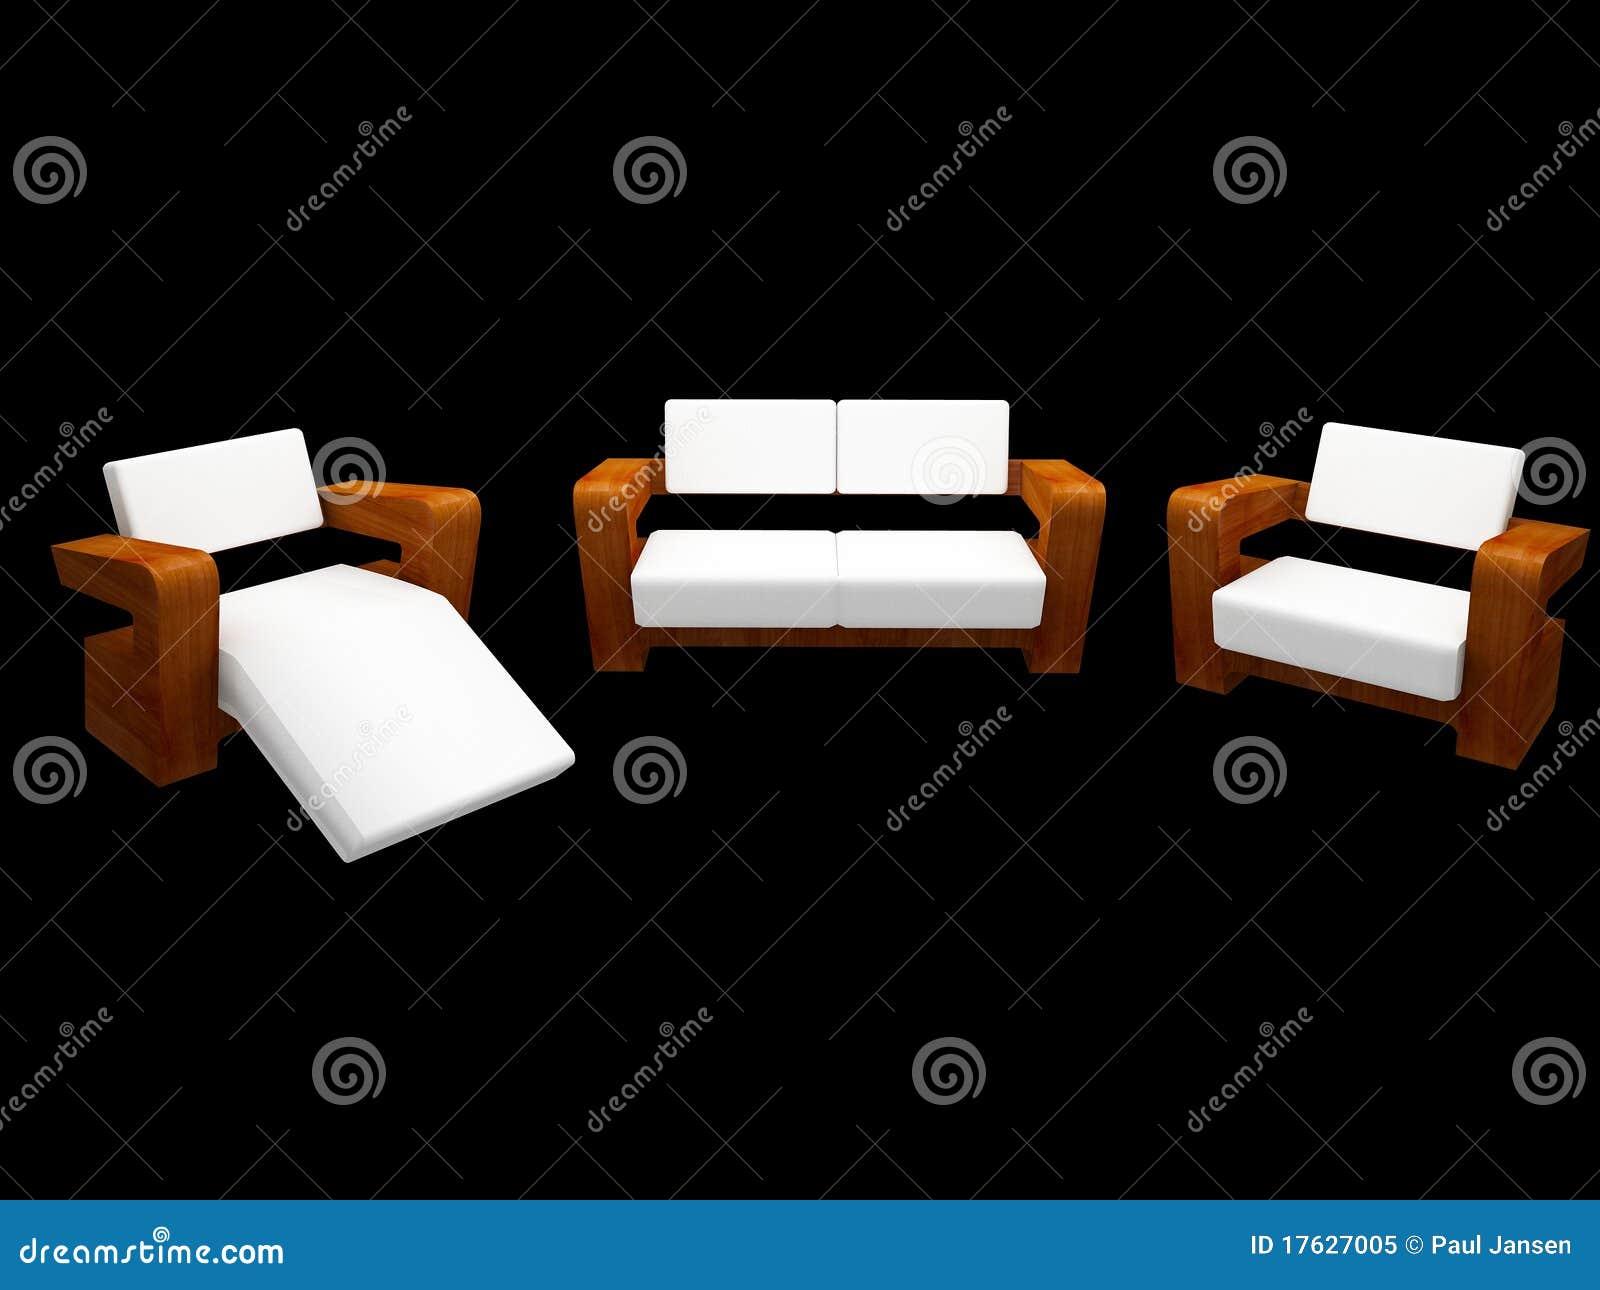 Muebles modernos stock de ilustraci n ilustraci n de for Stock de muebles